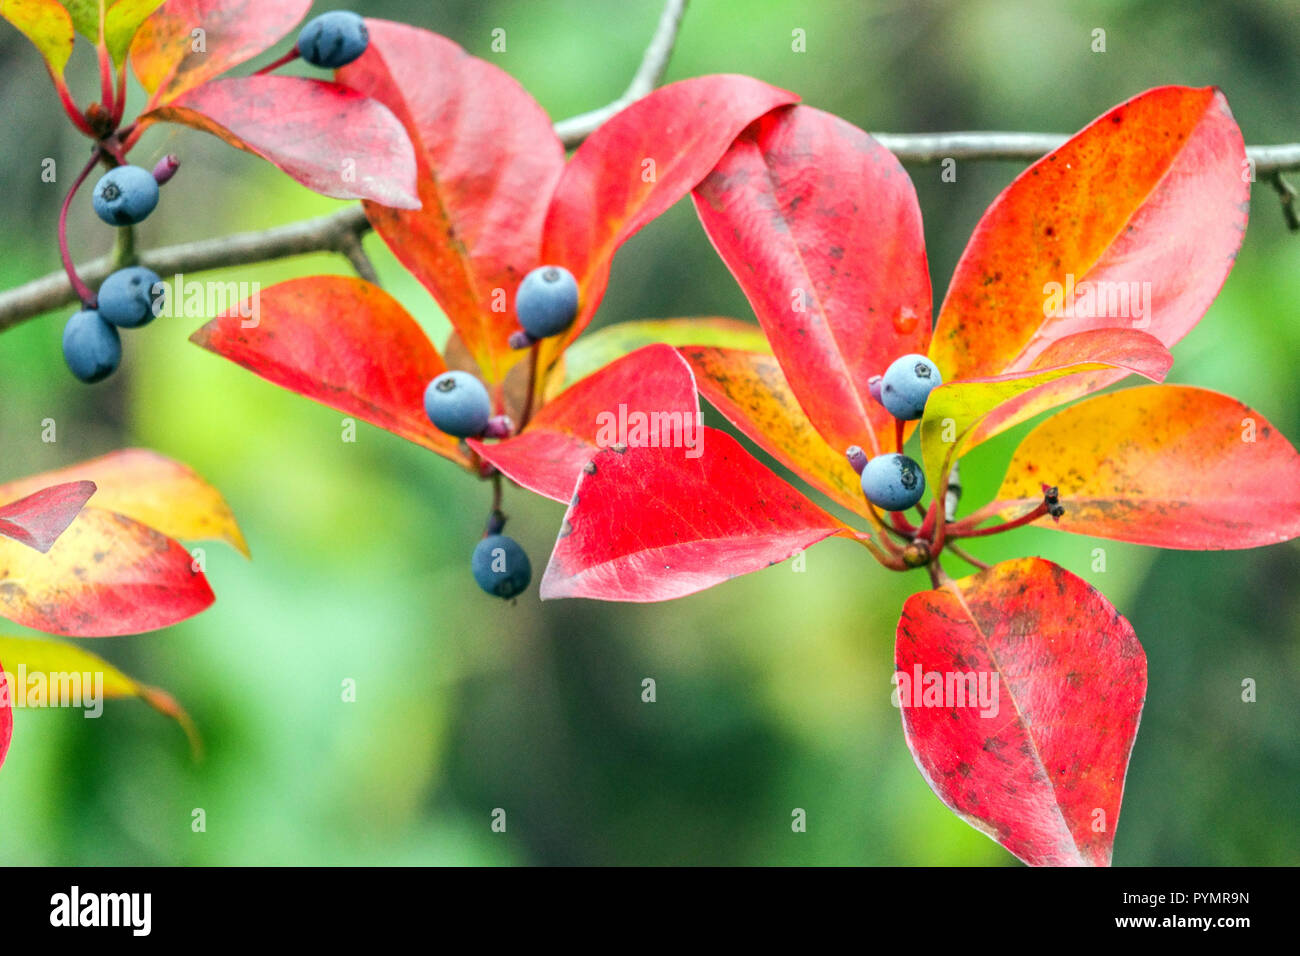 Nyssa sylvatica, Tupelo tree, Black gum autumn red leaves and berries - Stock Image